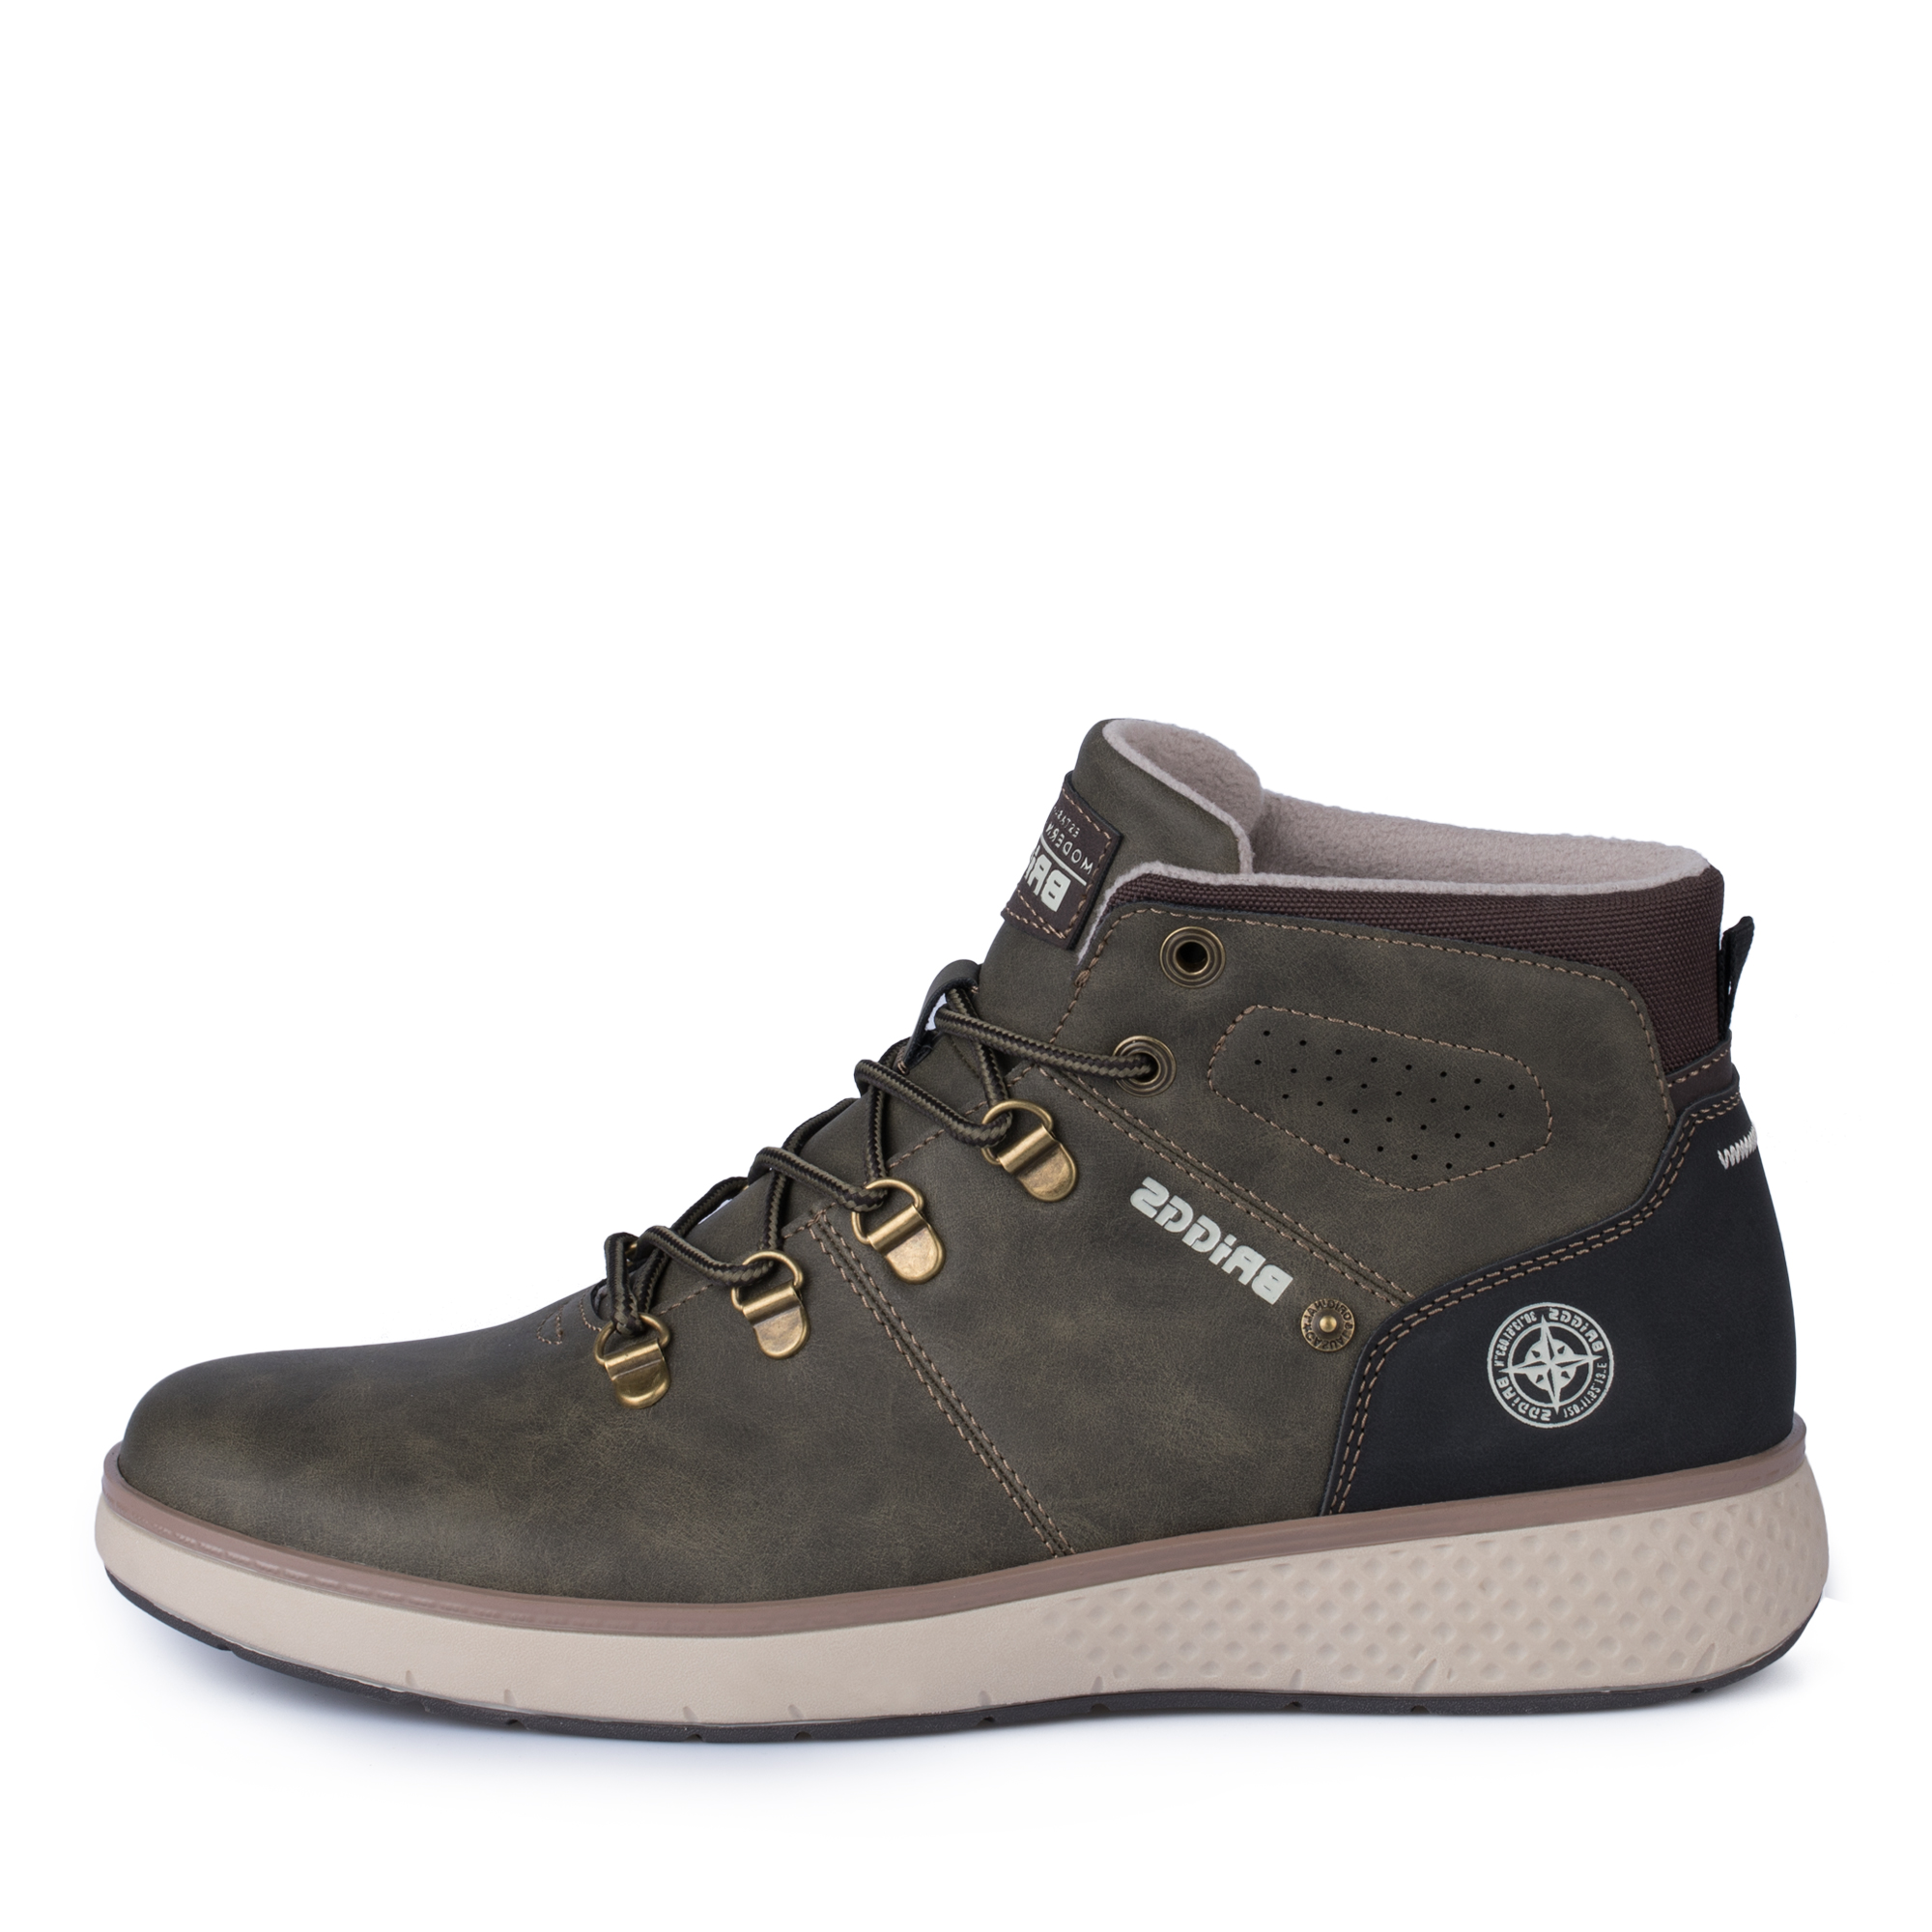 Ботинки BRIGGS 018-051A-2604